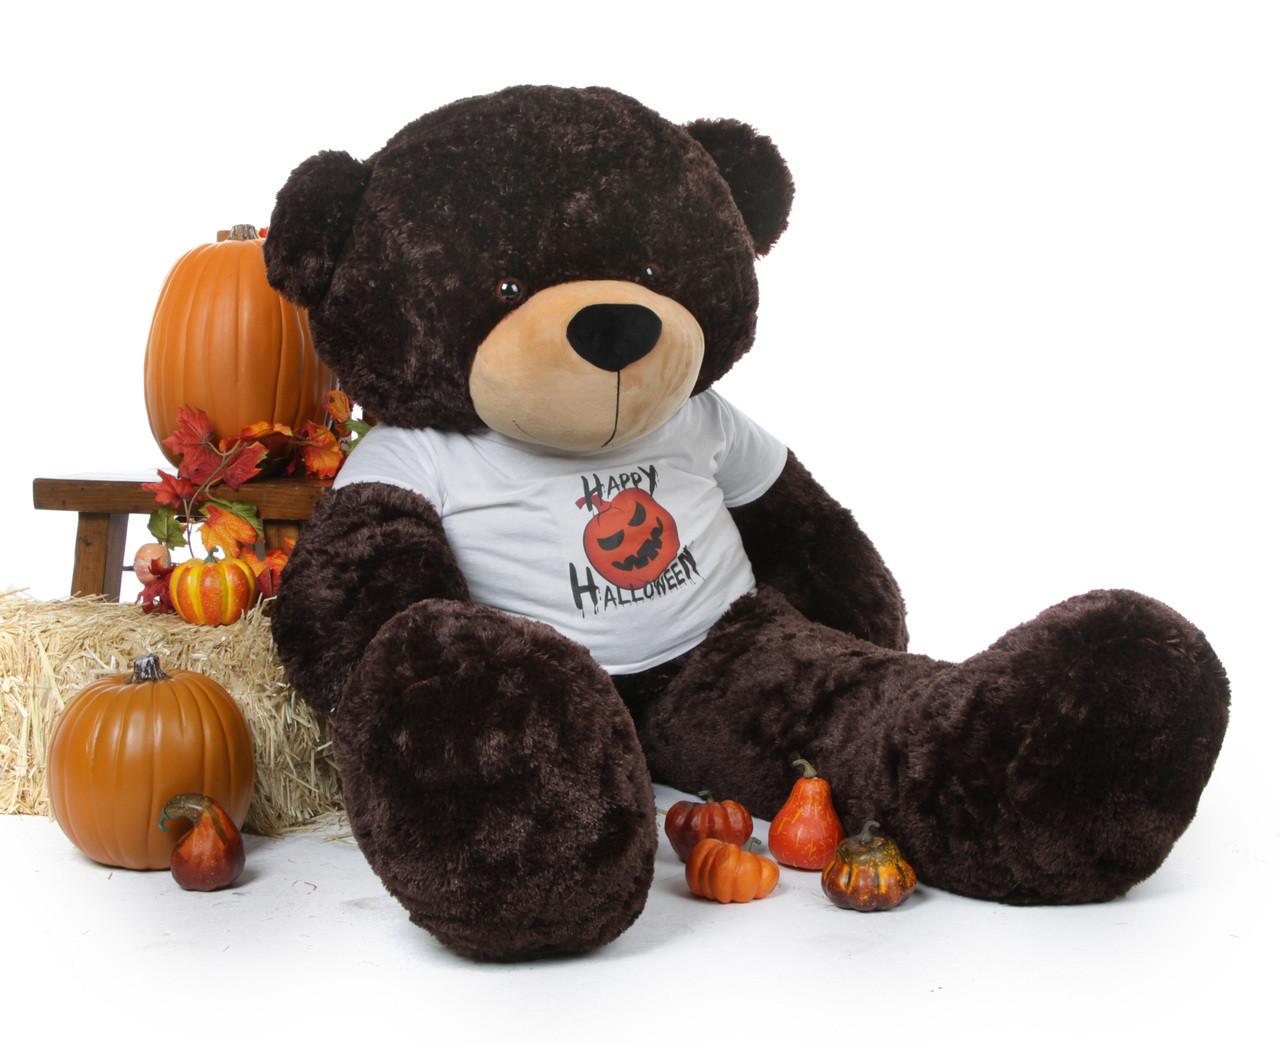 60 inch Giant Teddy Halloween Bear Brownie Cuddles wearing a Happy Halloween custom t-shirt with a black and orange jack-o-lantern is an amazing gift!